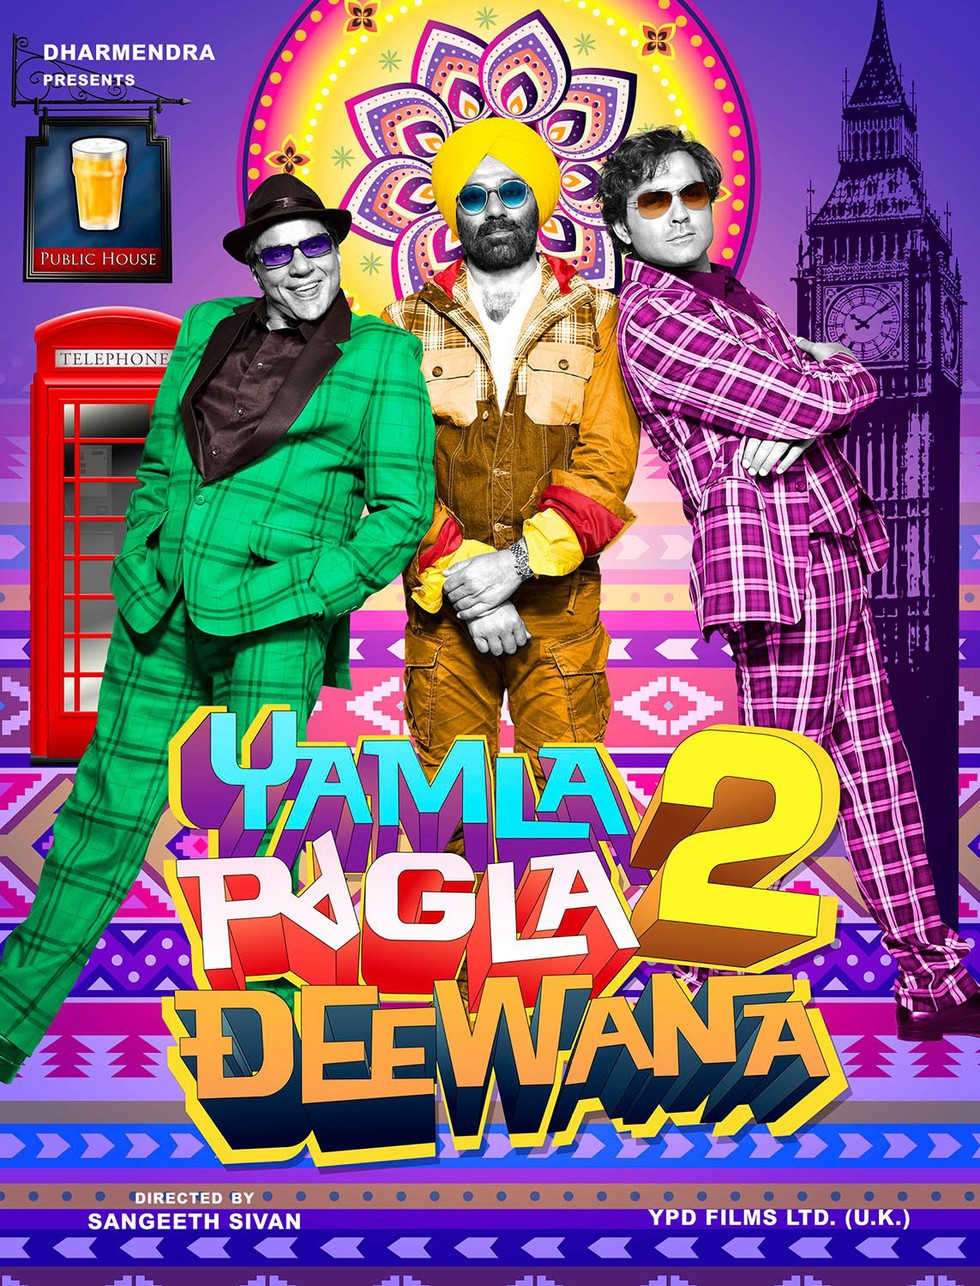 Yamla Pagla Deewana 2 - Movie Poster #2 (Large)